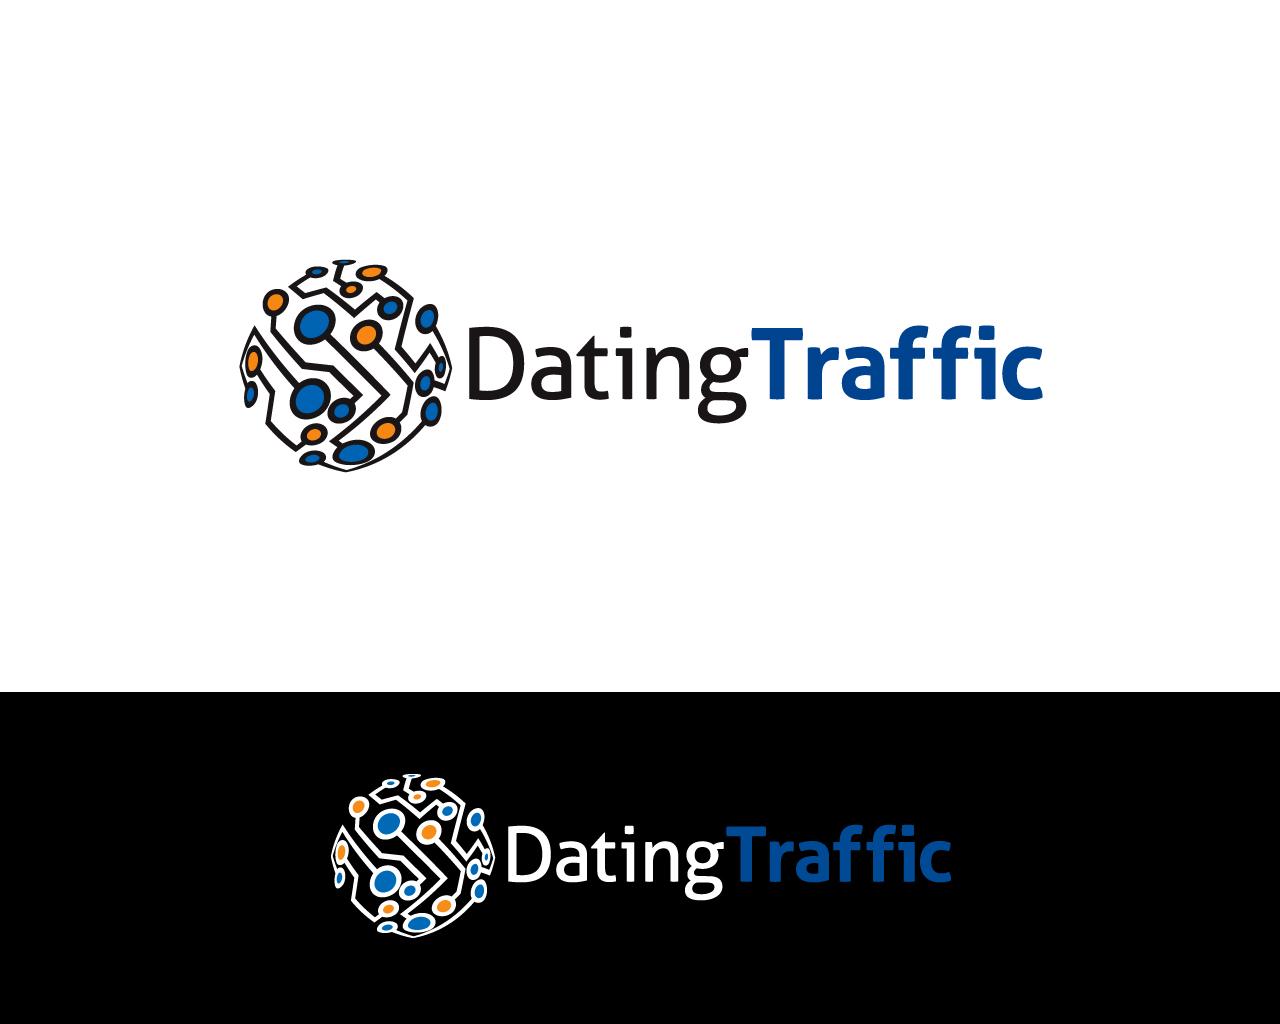 Guide to online dating reddit